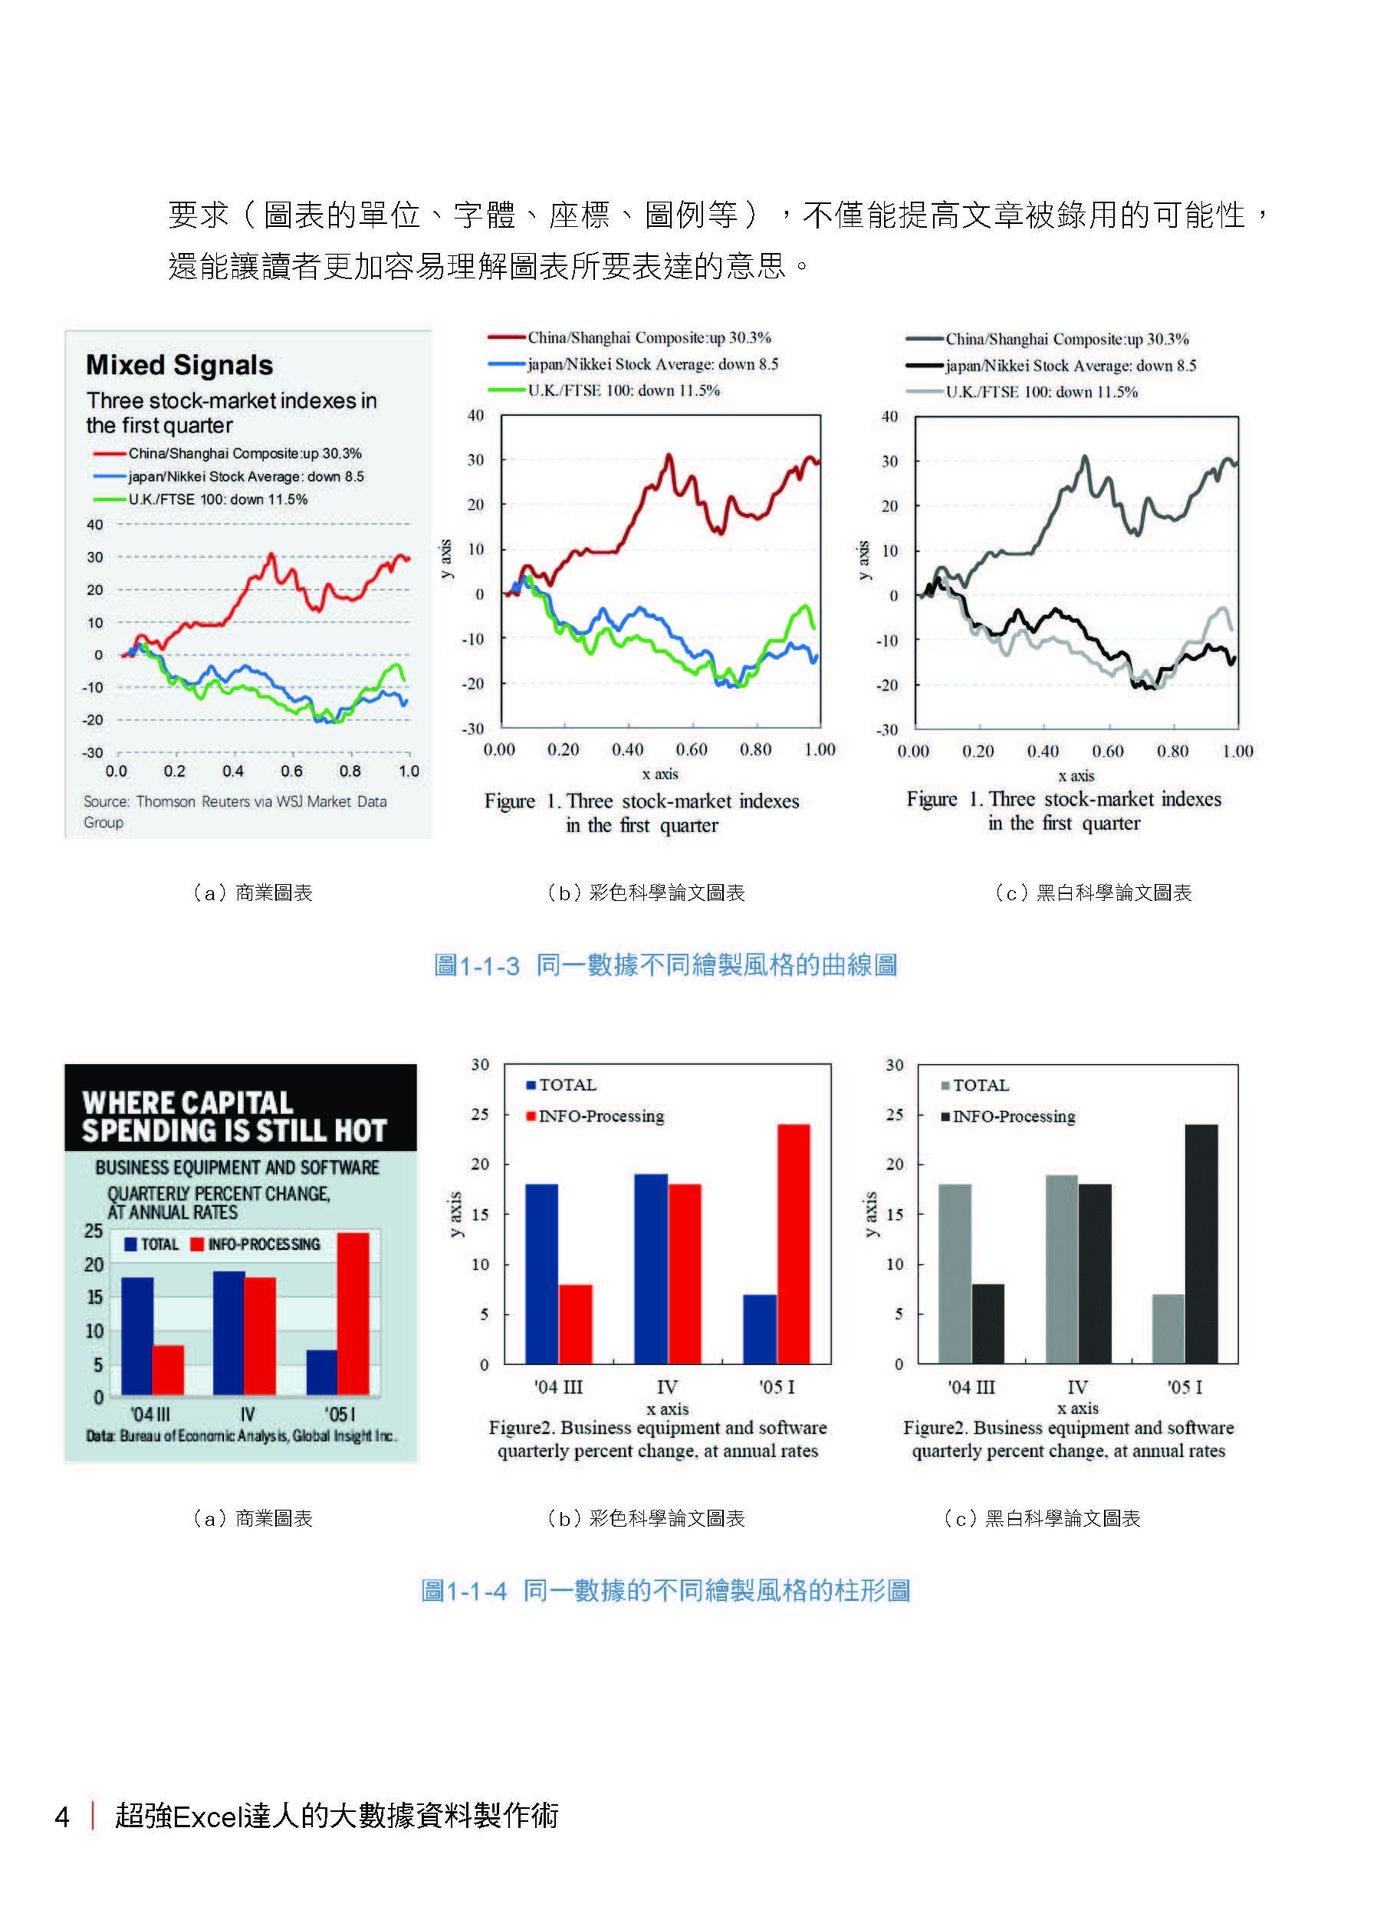 《The Wall Street Journal》與《Business Week》都在用的商務圖表技法:超強Excel達人的大數據資料製作術-preview-5